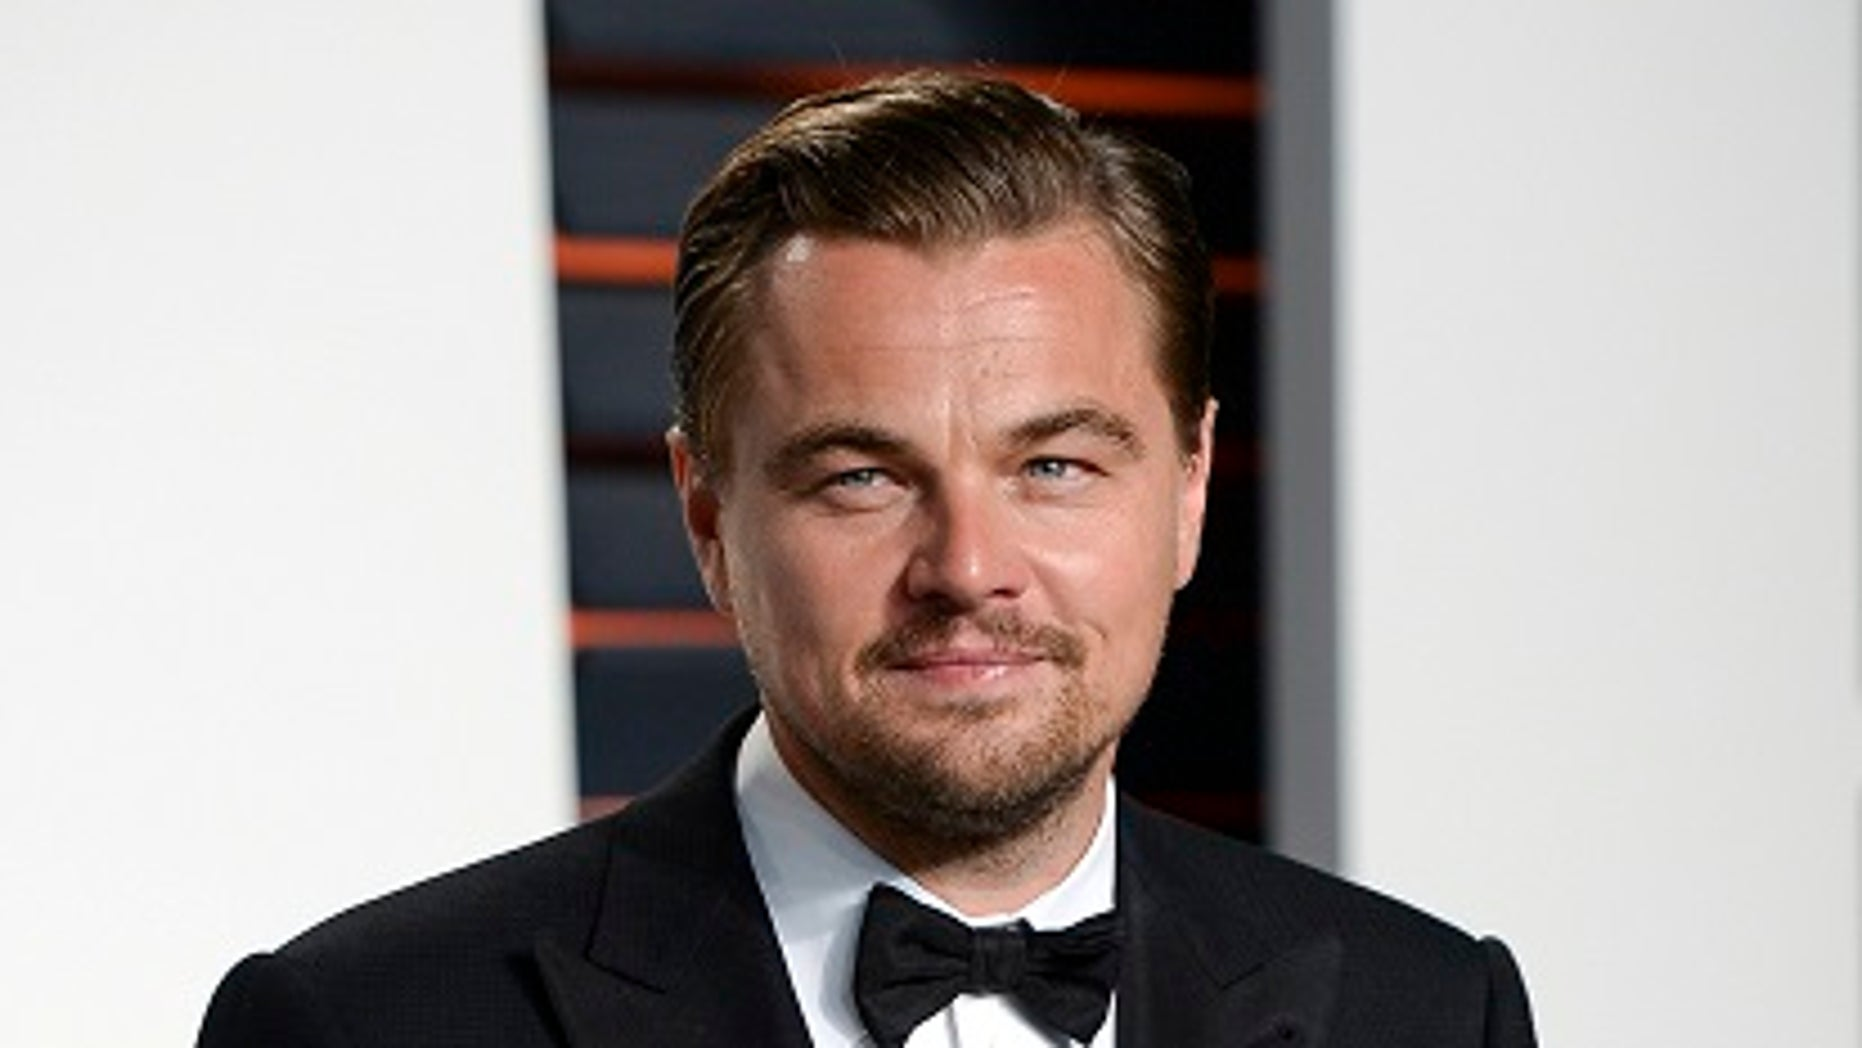 Leonardo DiCaprio's foundation has awarded $20 million in eco-grants.